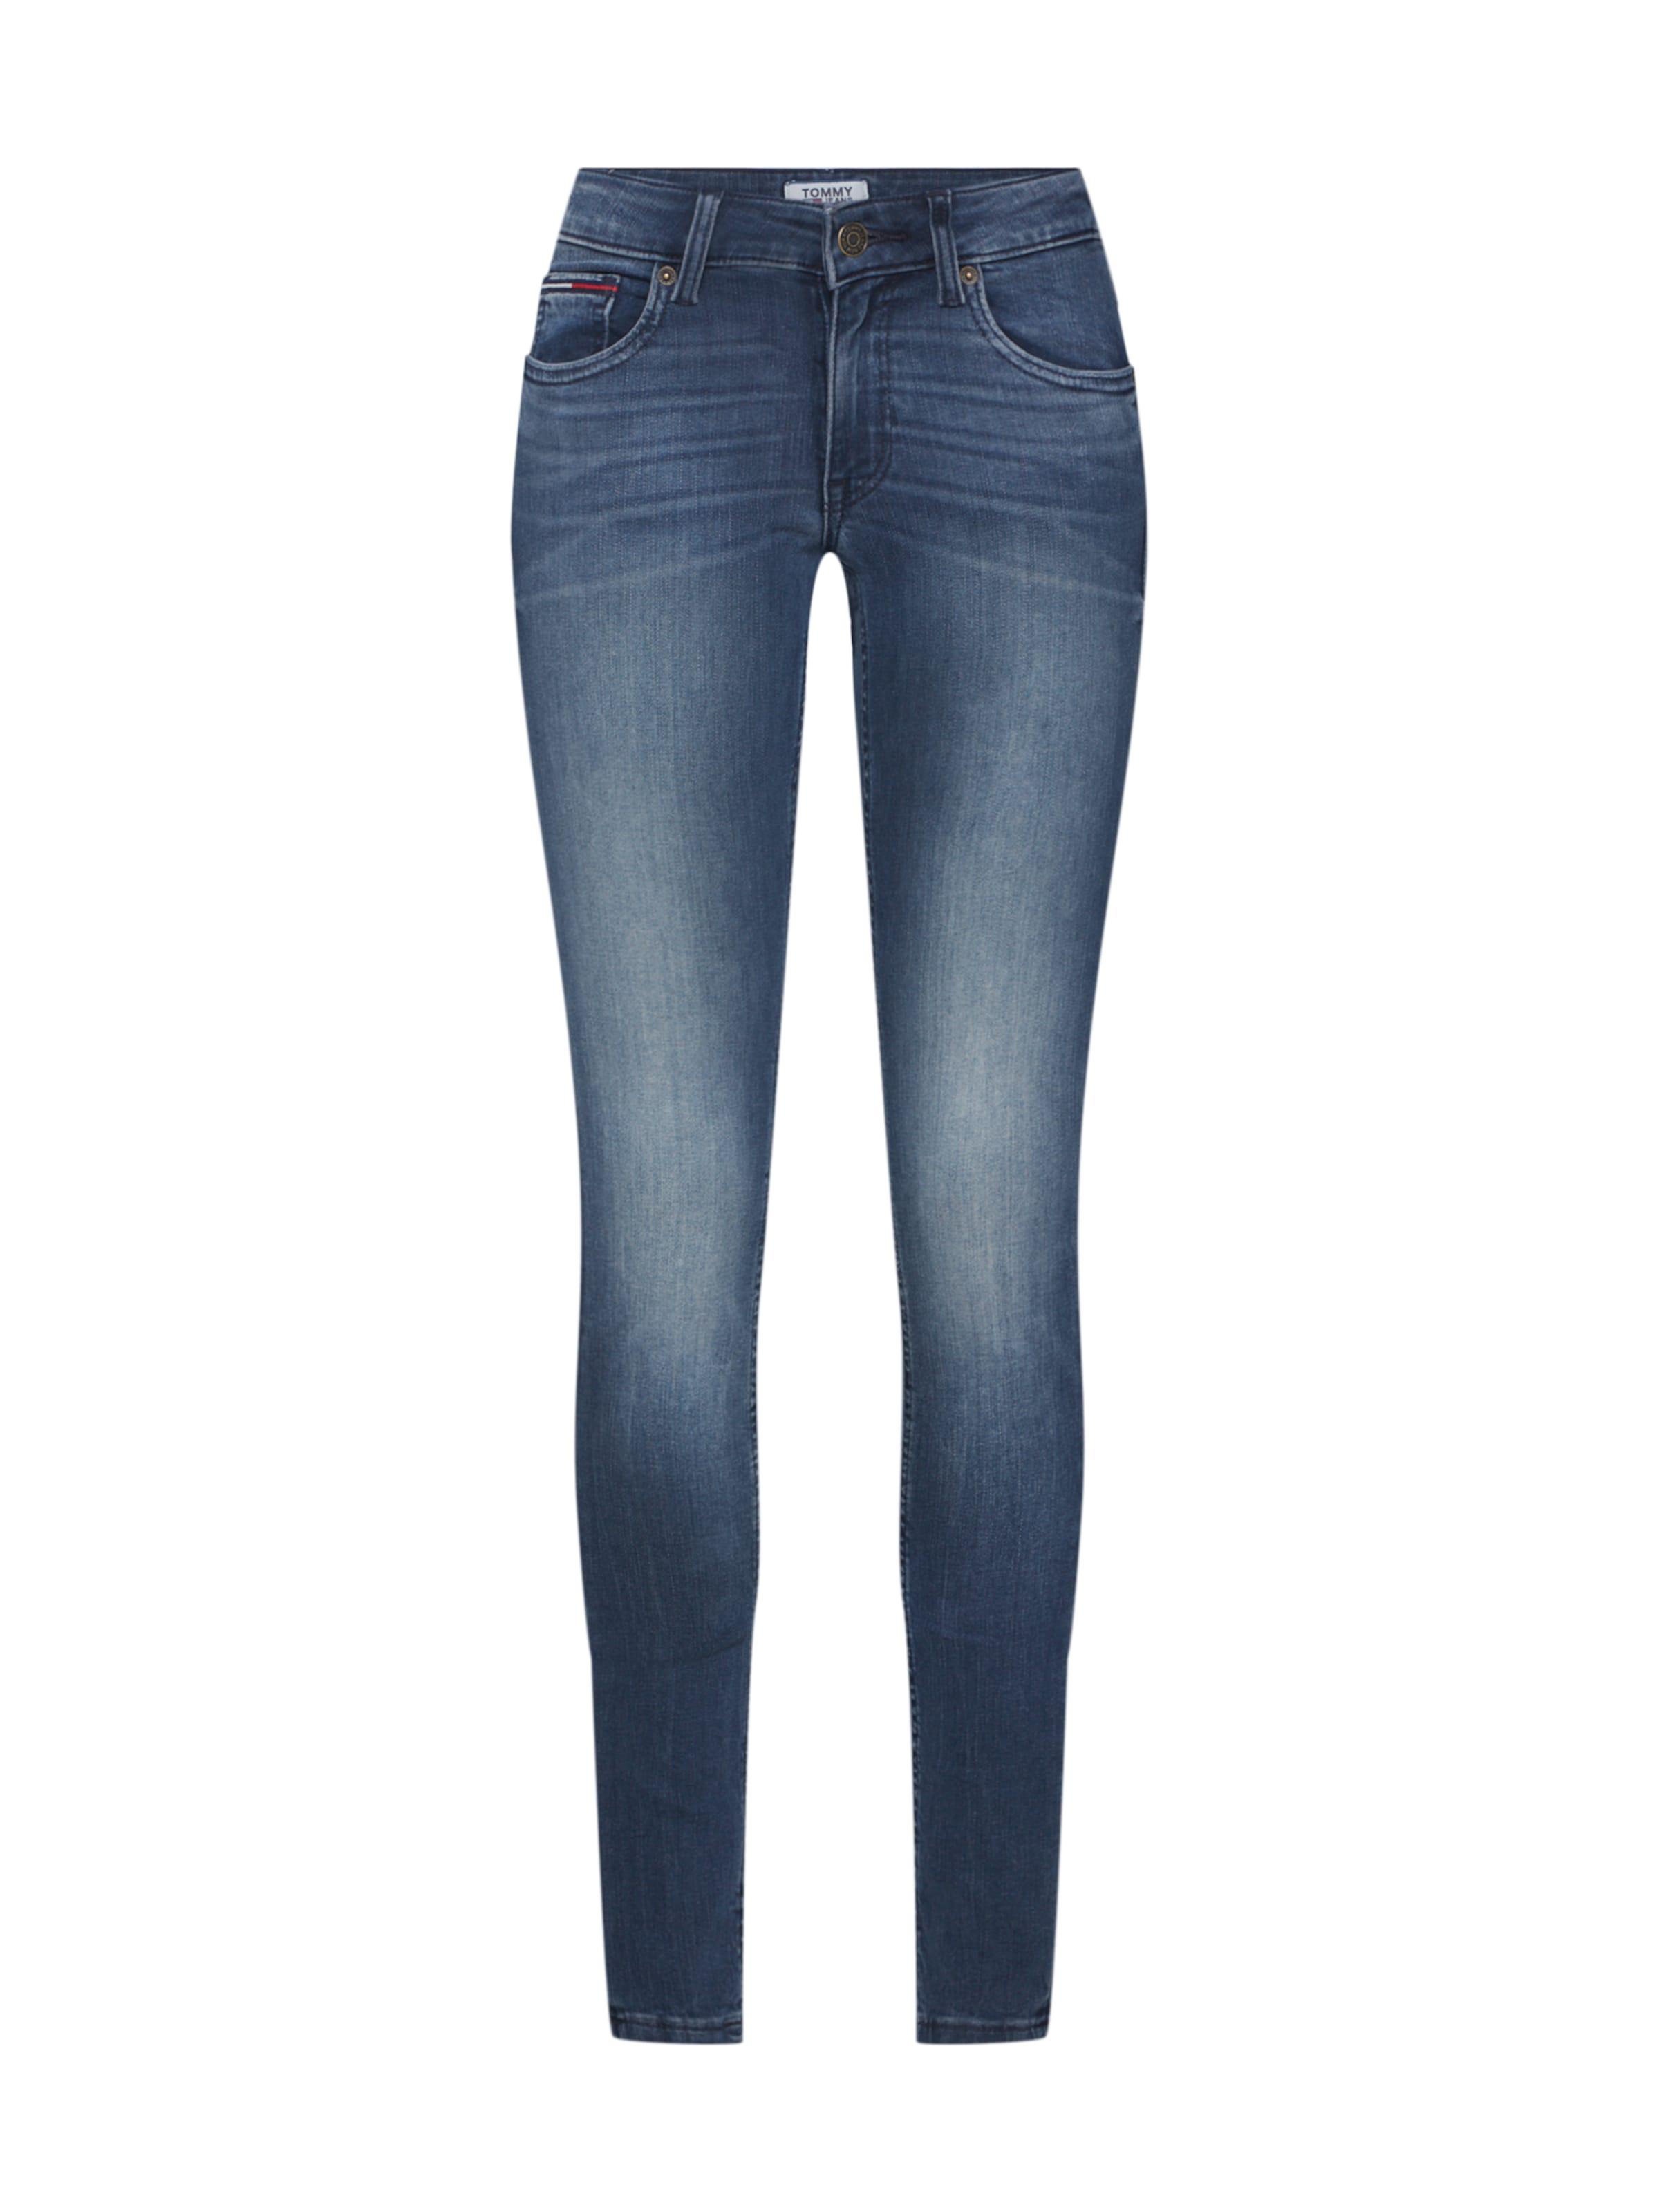 Blue Denim Sophie Ebndk' 'low Rise Skinny In Jeans Tommy LVGMjUzpqS